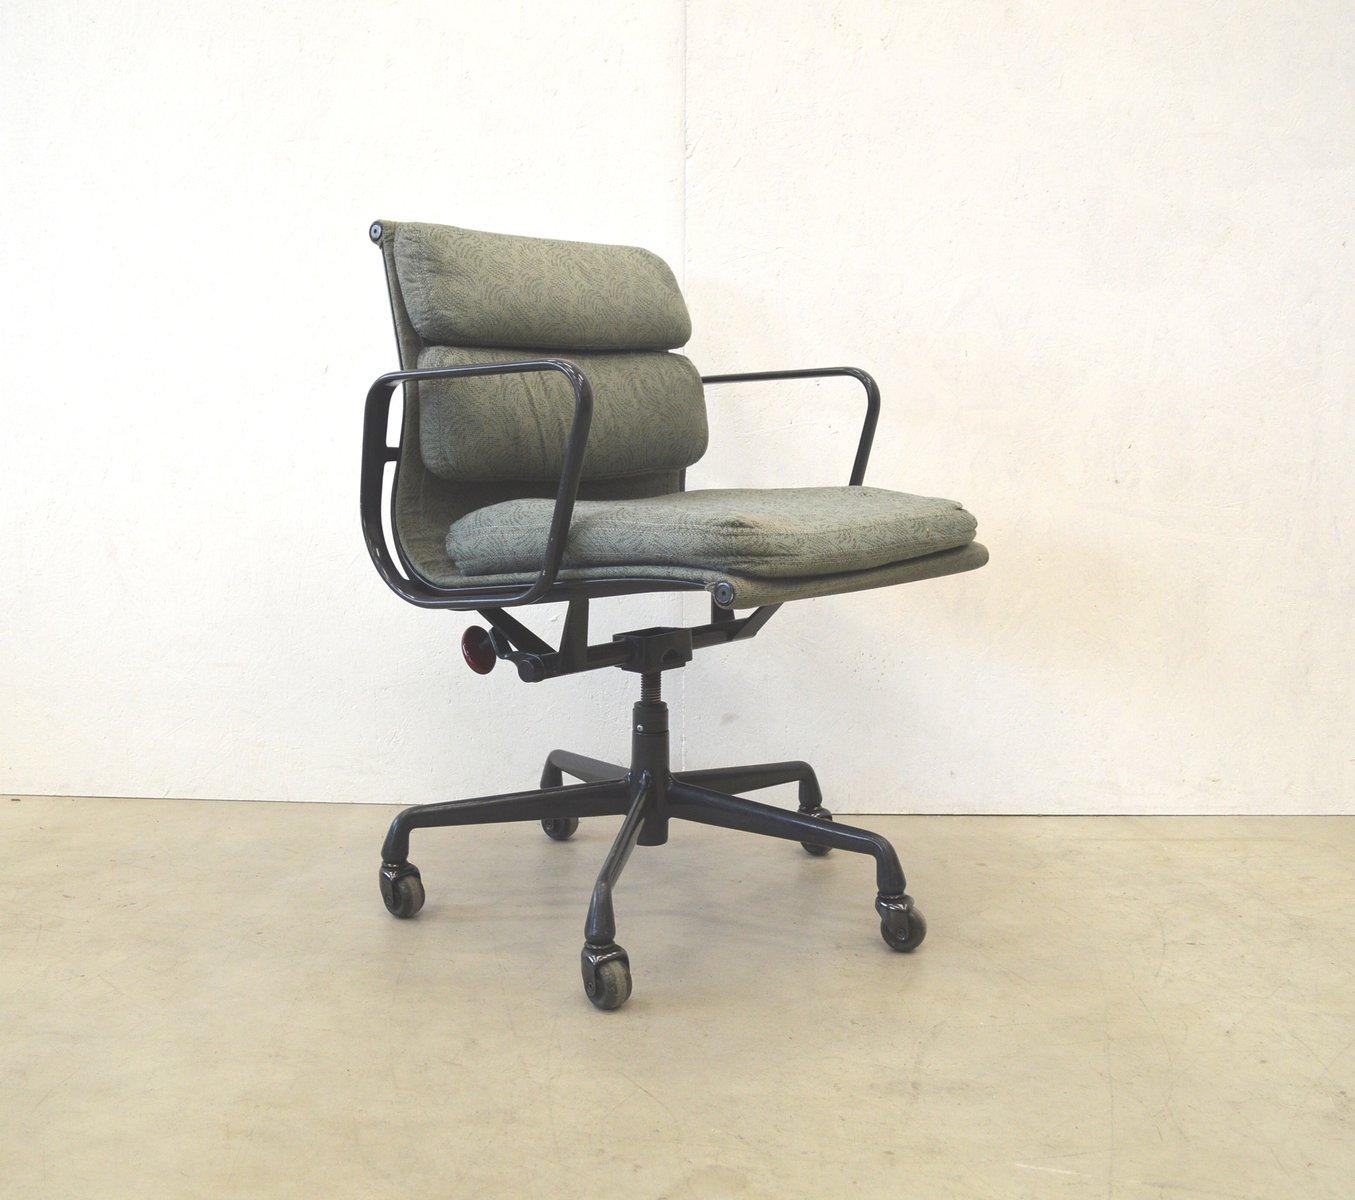 Miller Bürostuhl amerikanischer ea217 aluminium bürostuhl charles eames für